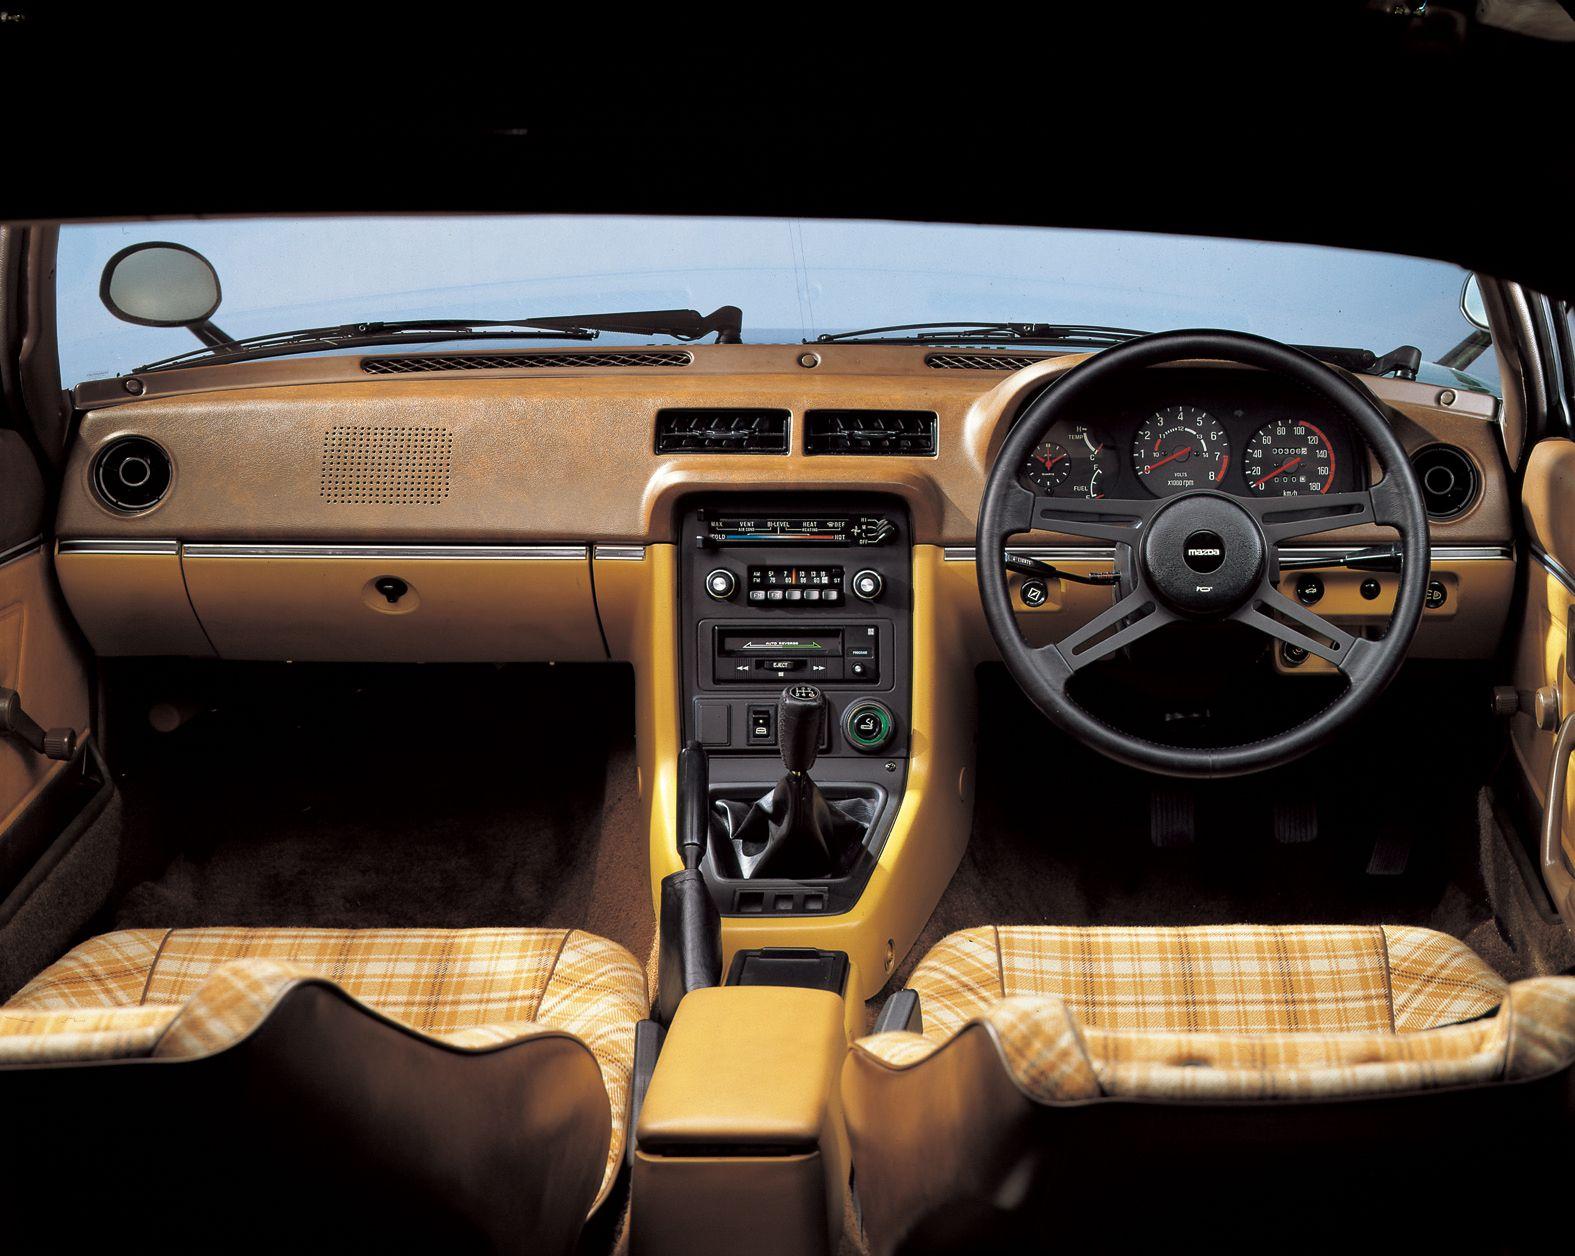 Mazda RX-7 Savanna 1980 interior